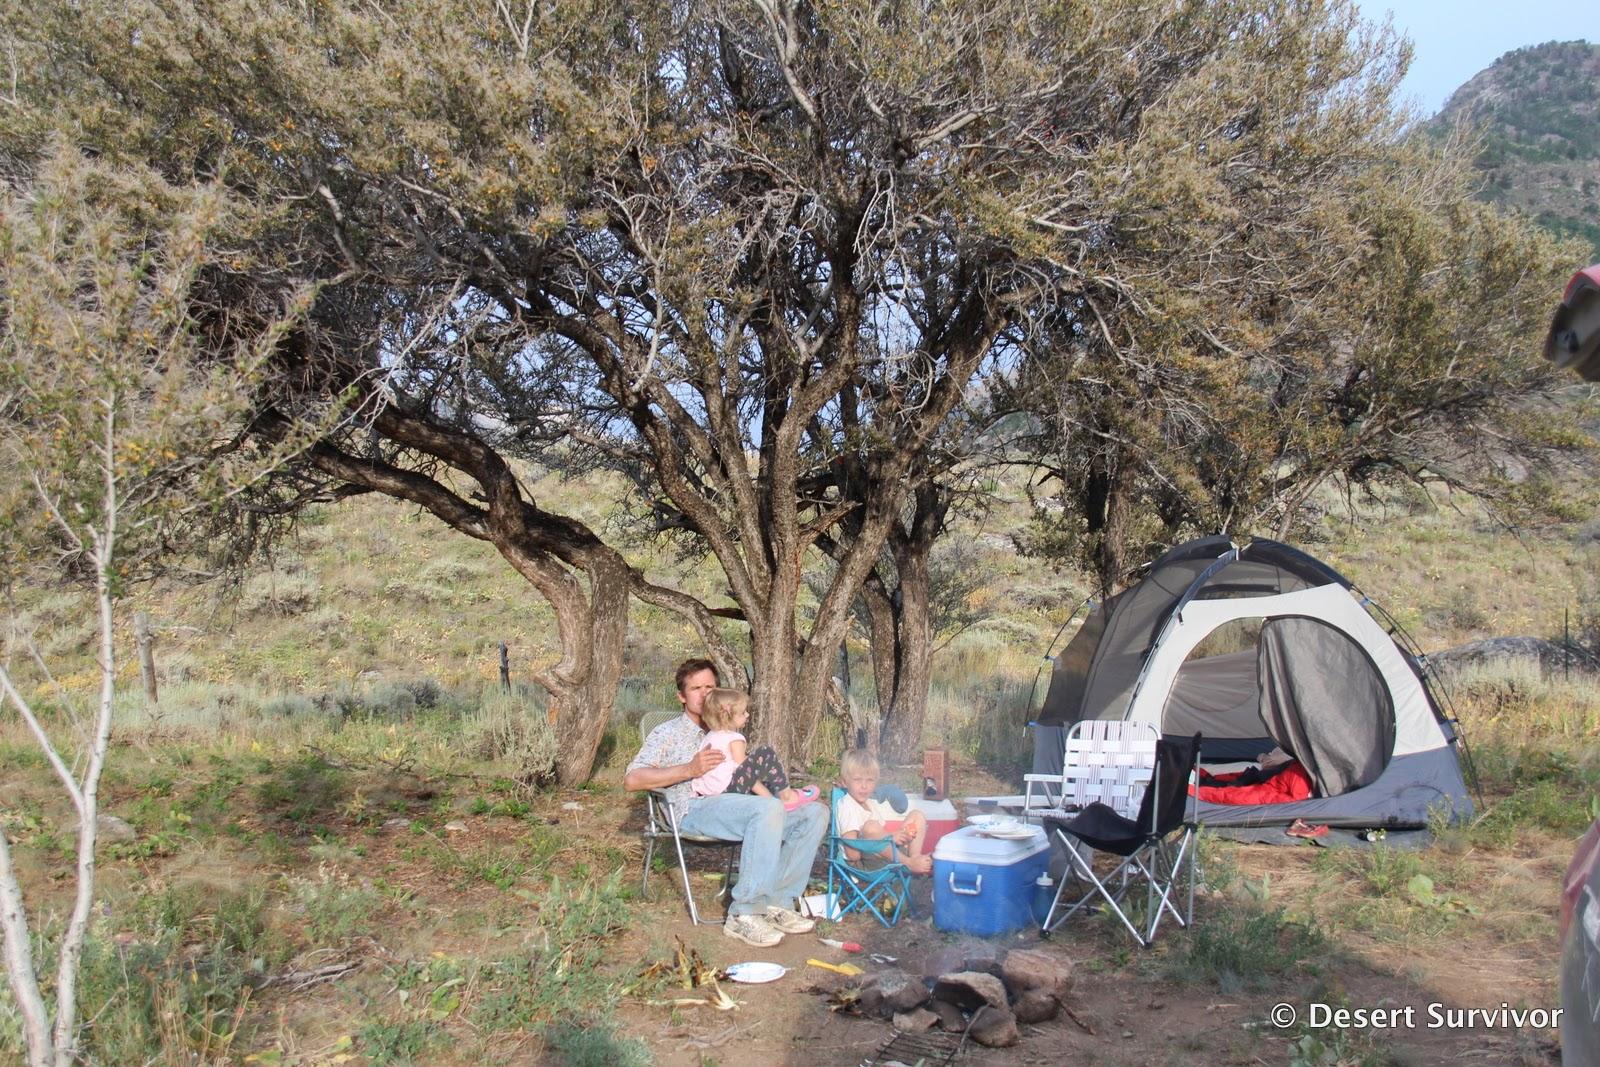 desert survivor desert survivor u0027s get out and camp challenge